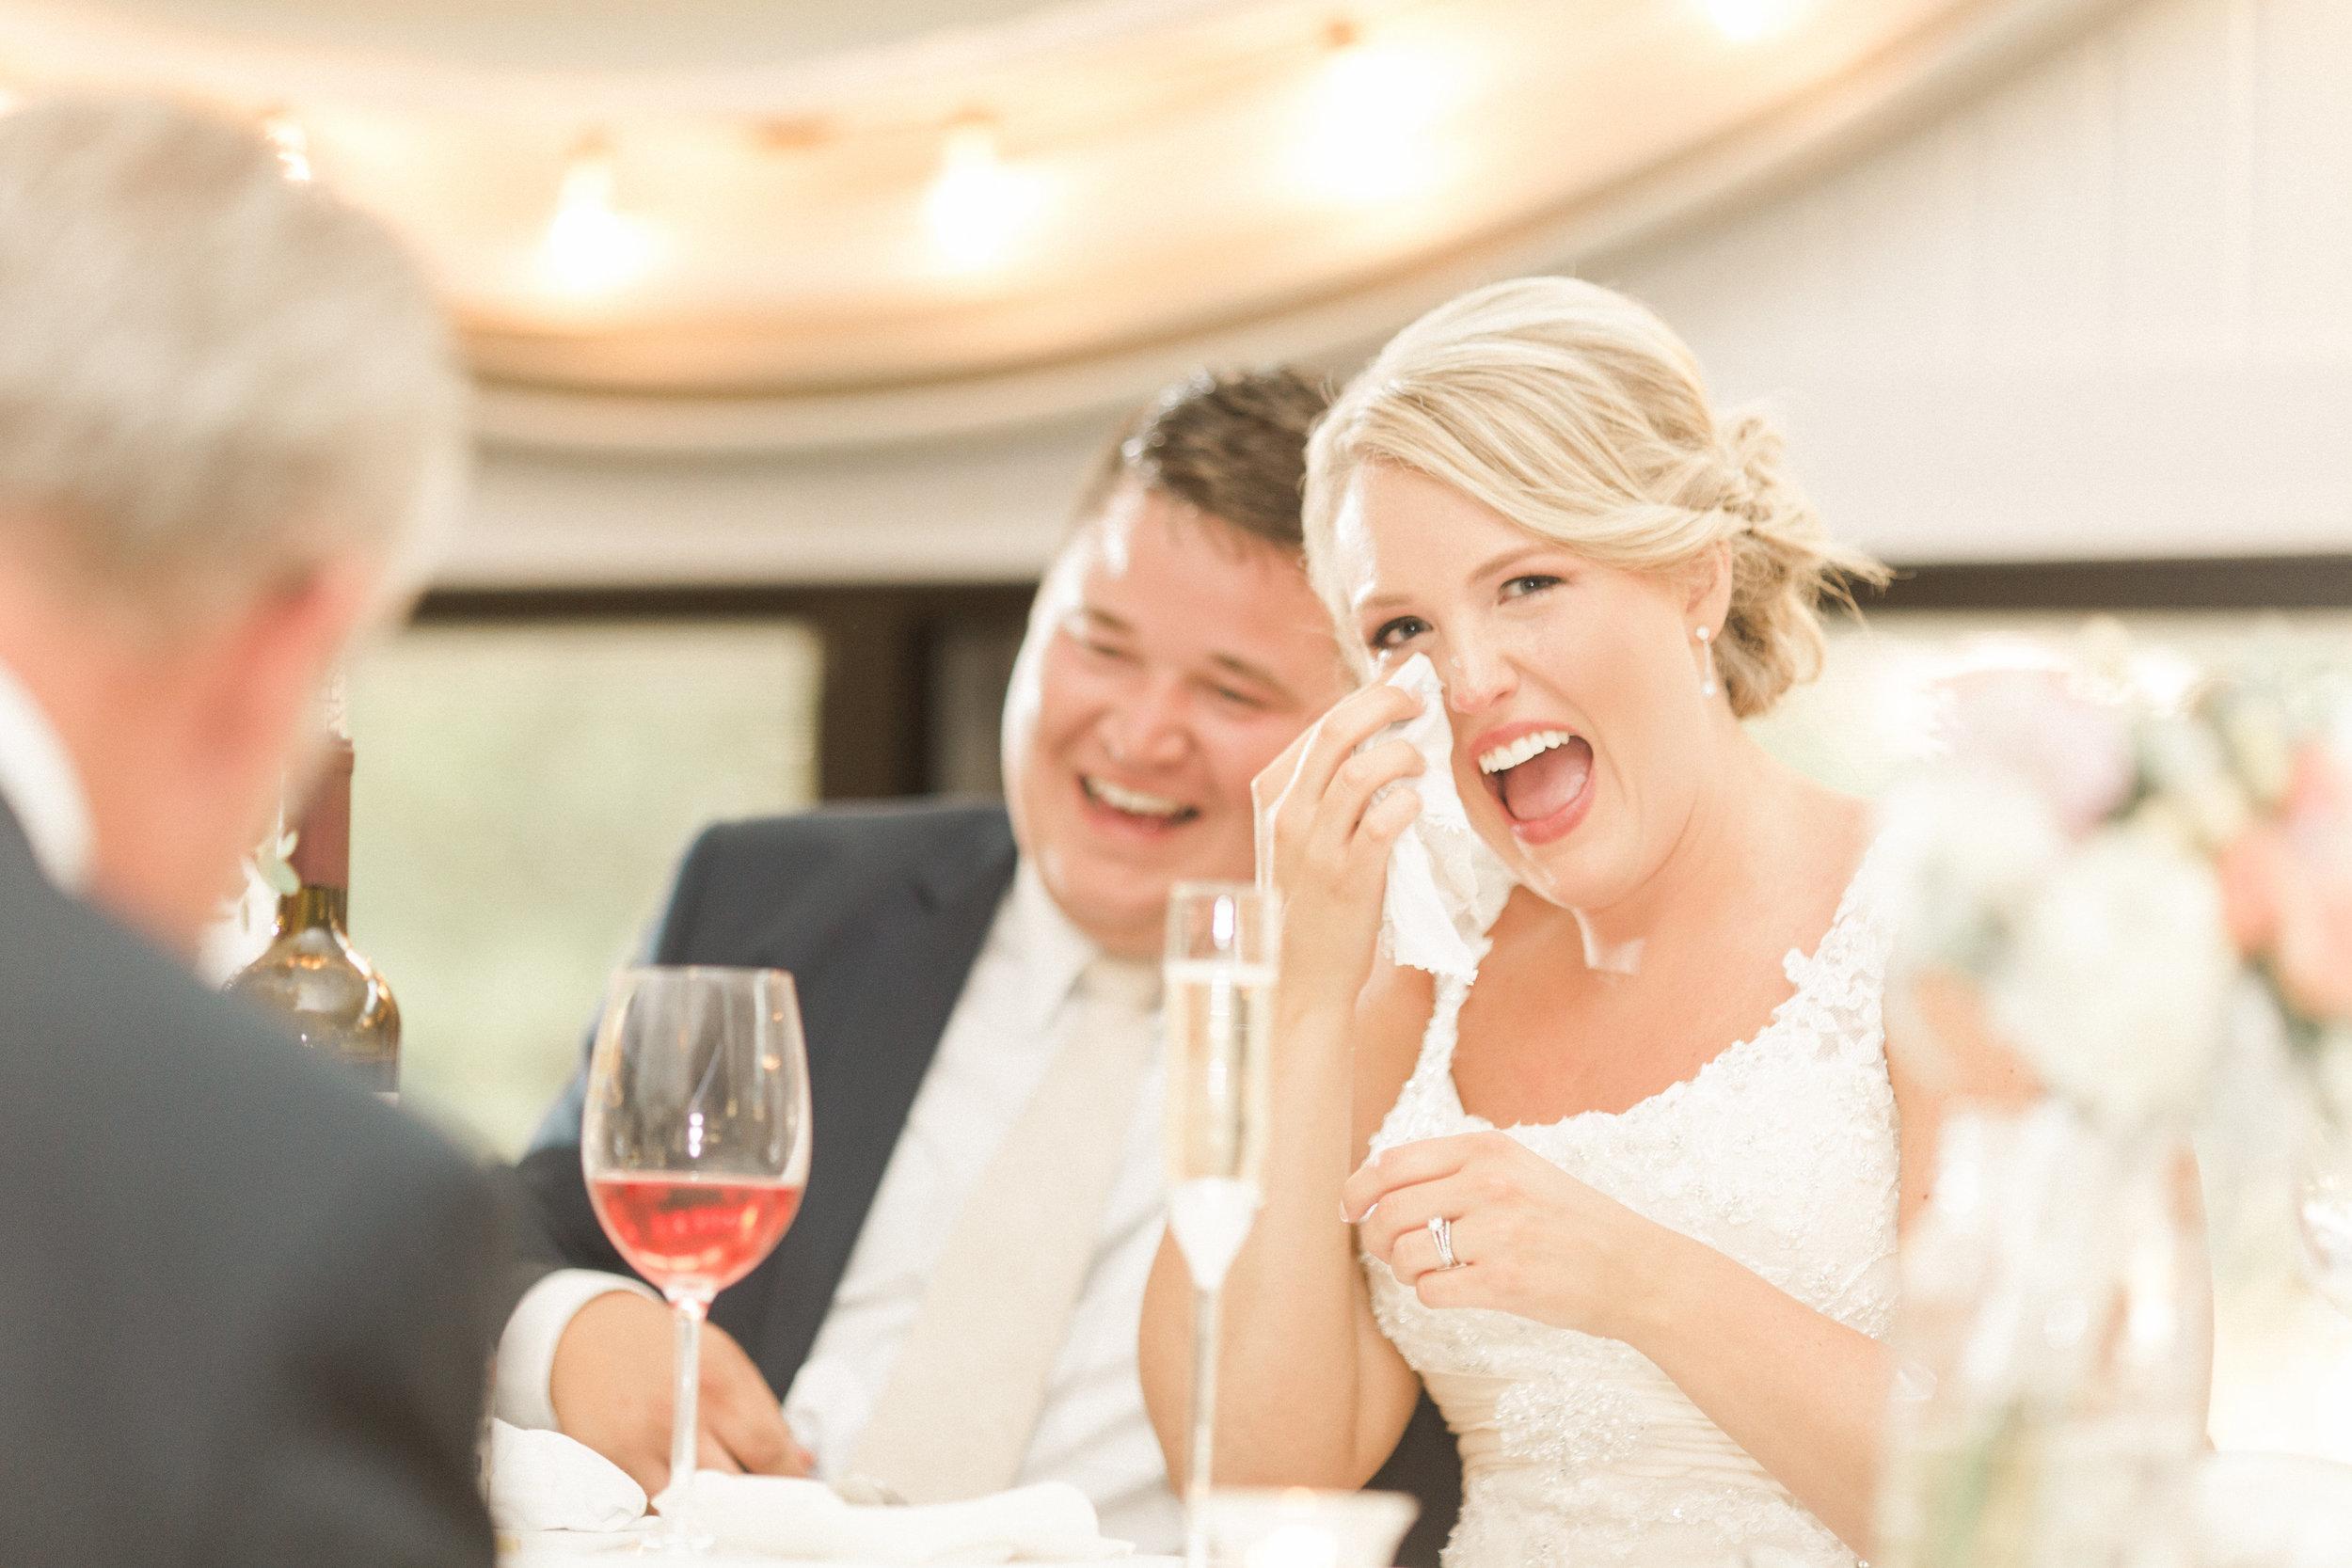 bride-candid-reception-toast-photo